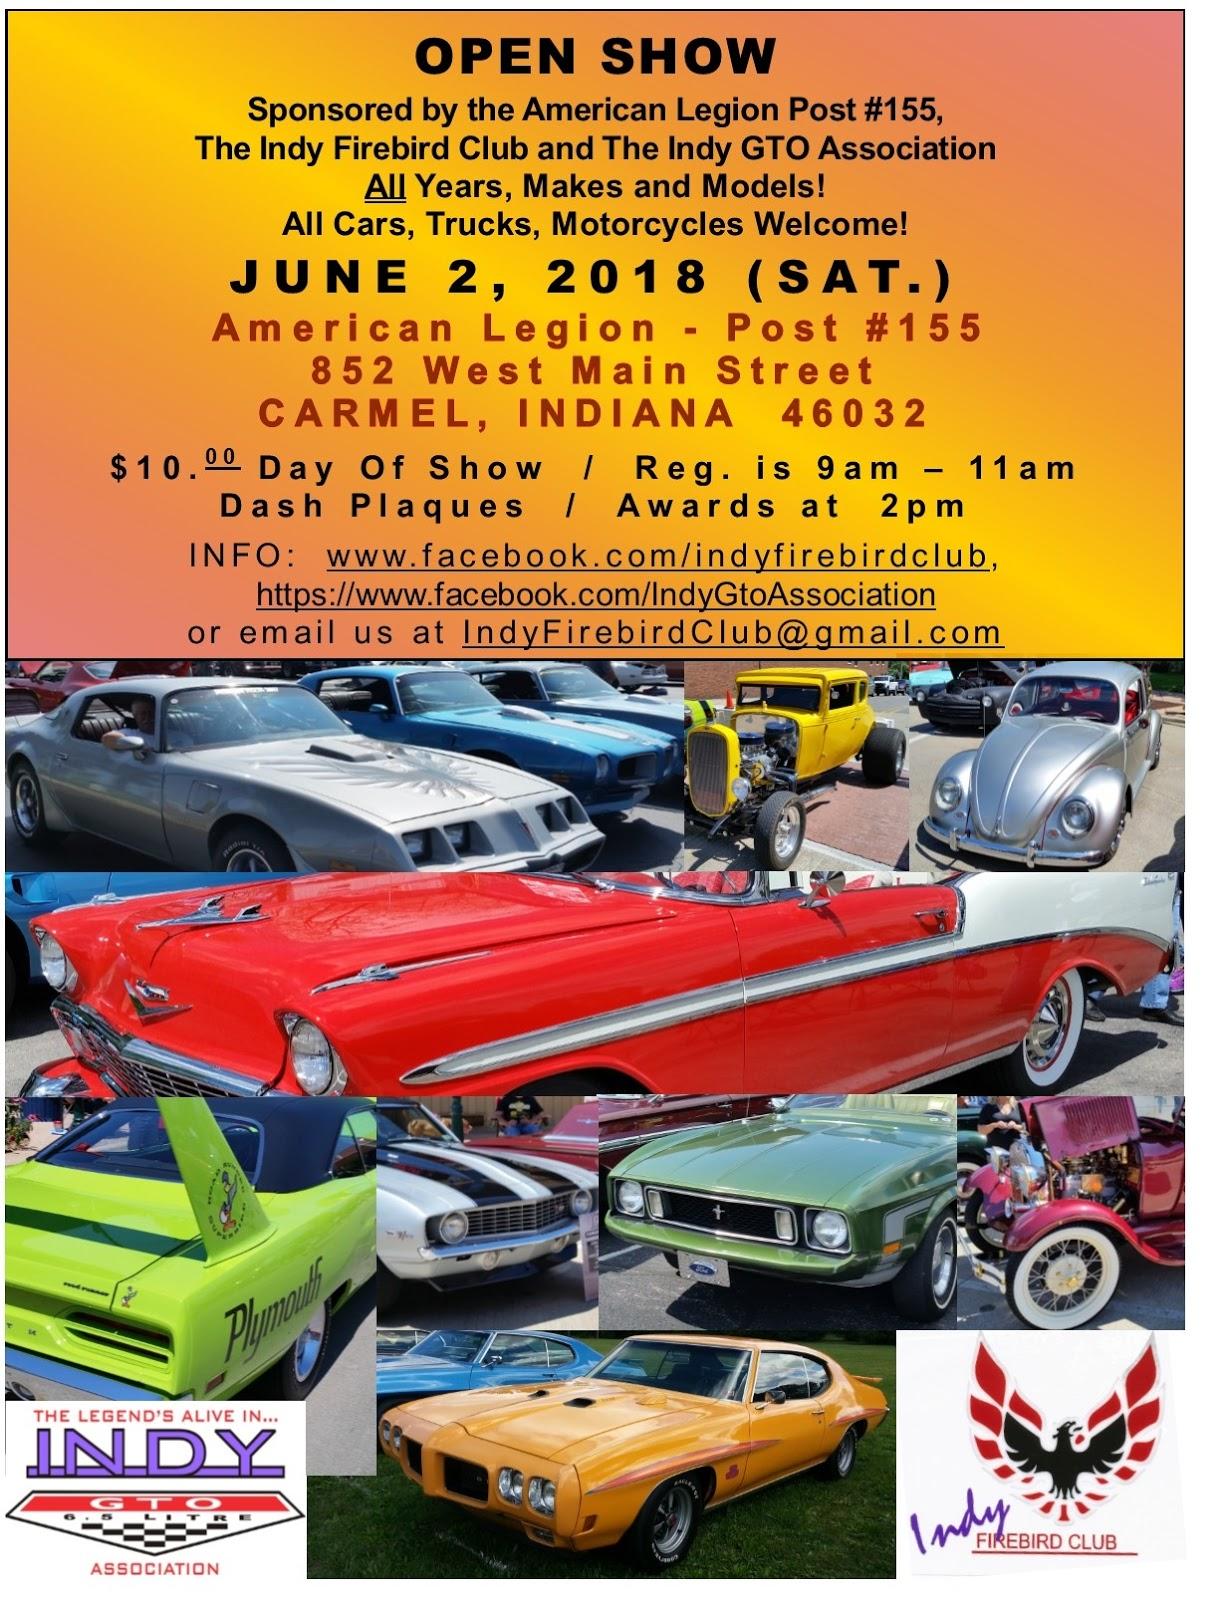 Indy GTO Association - Carmel indiana car show